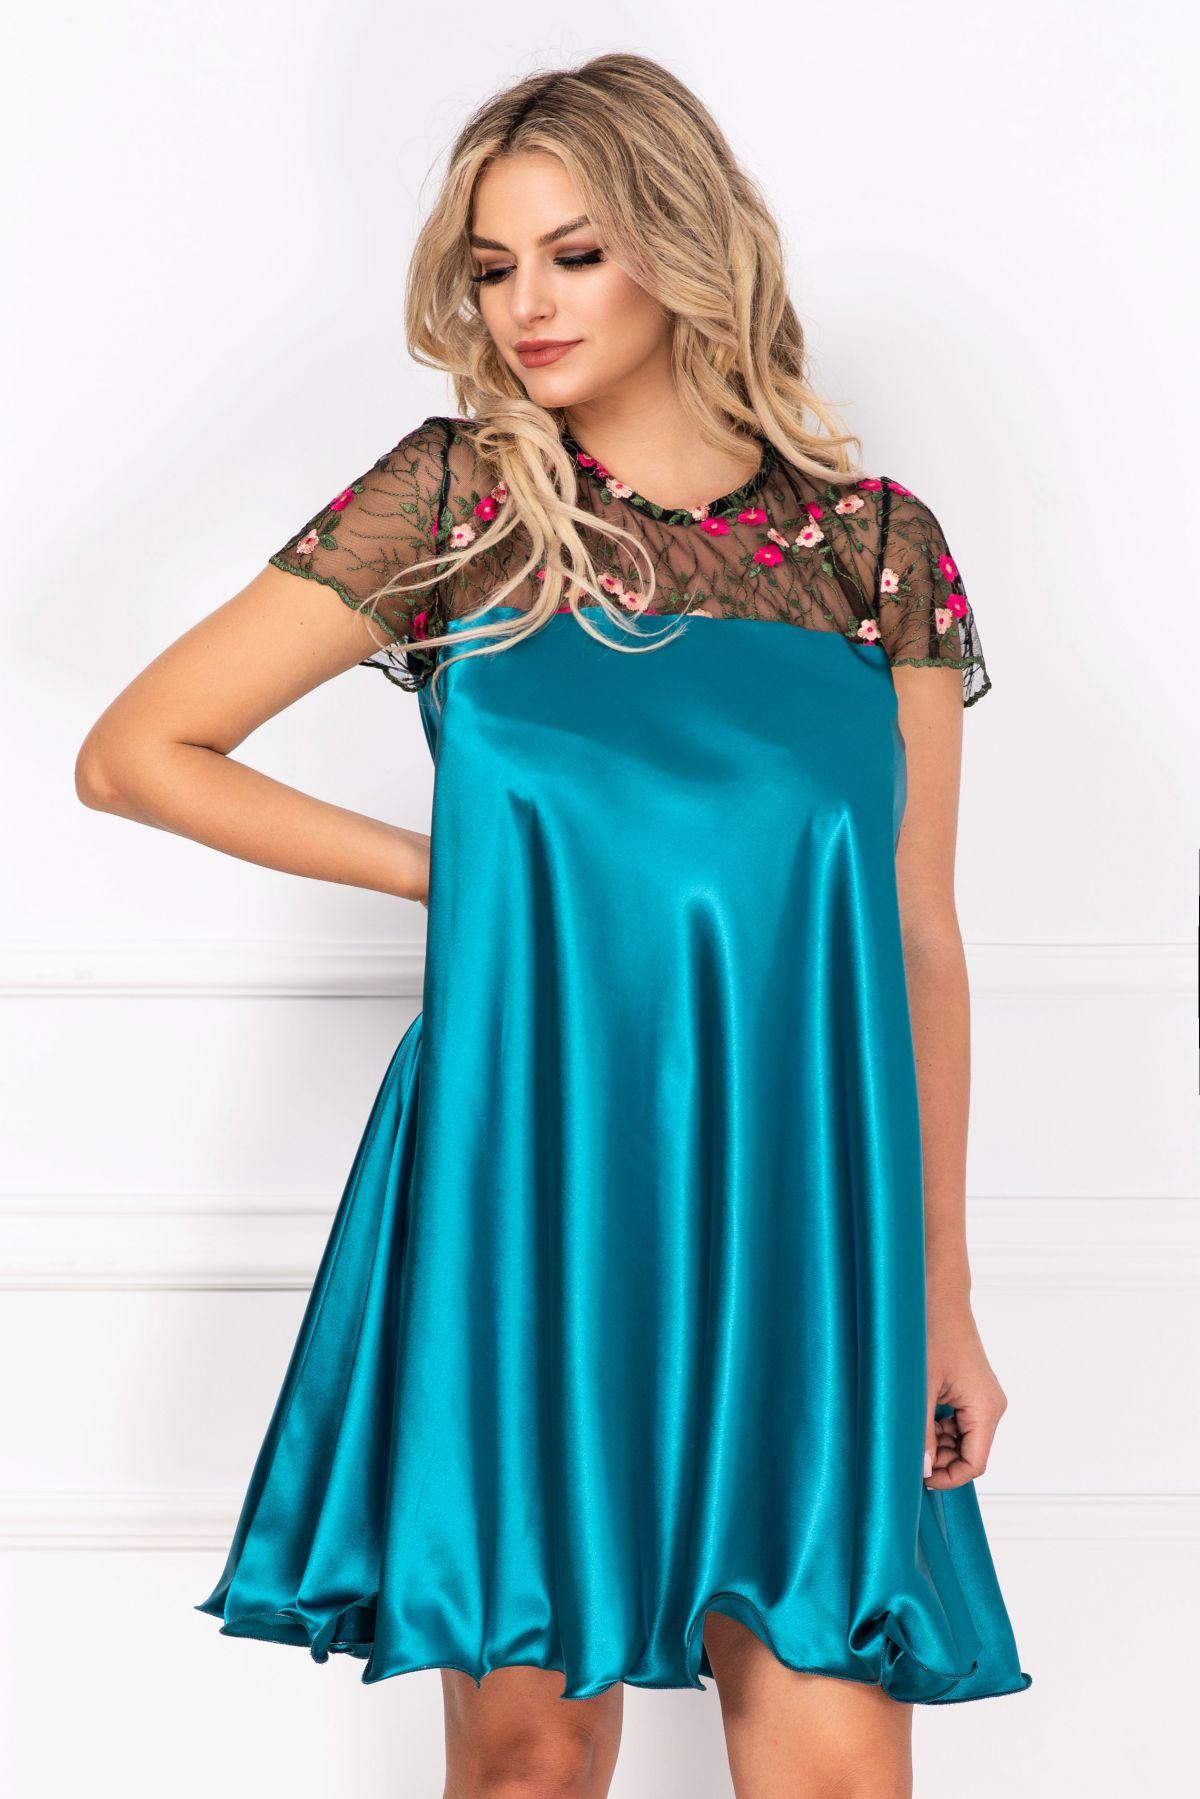 Rochie de cununie Erin turquoise din satin cu broderie By InPuff